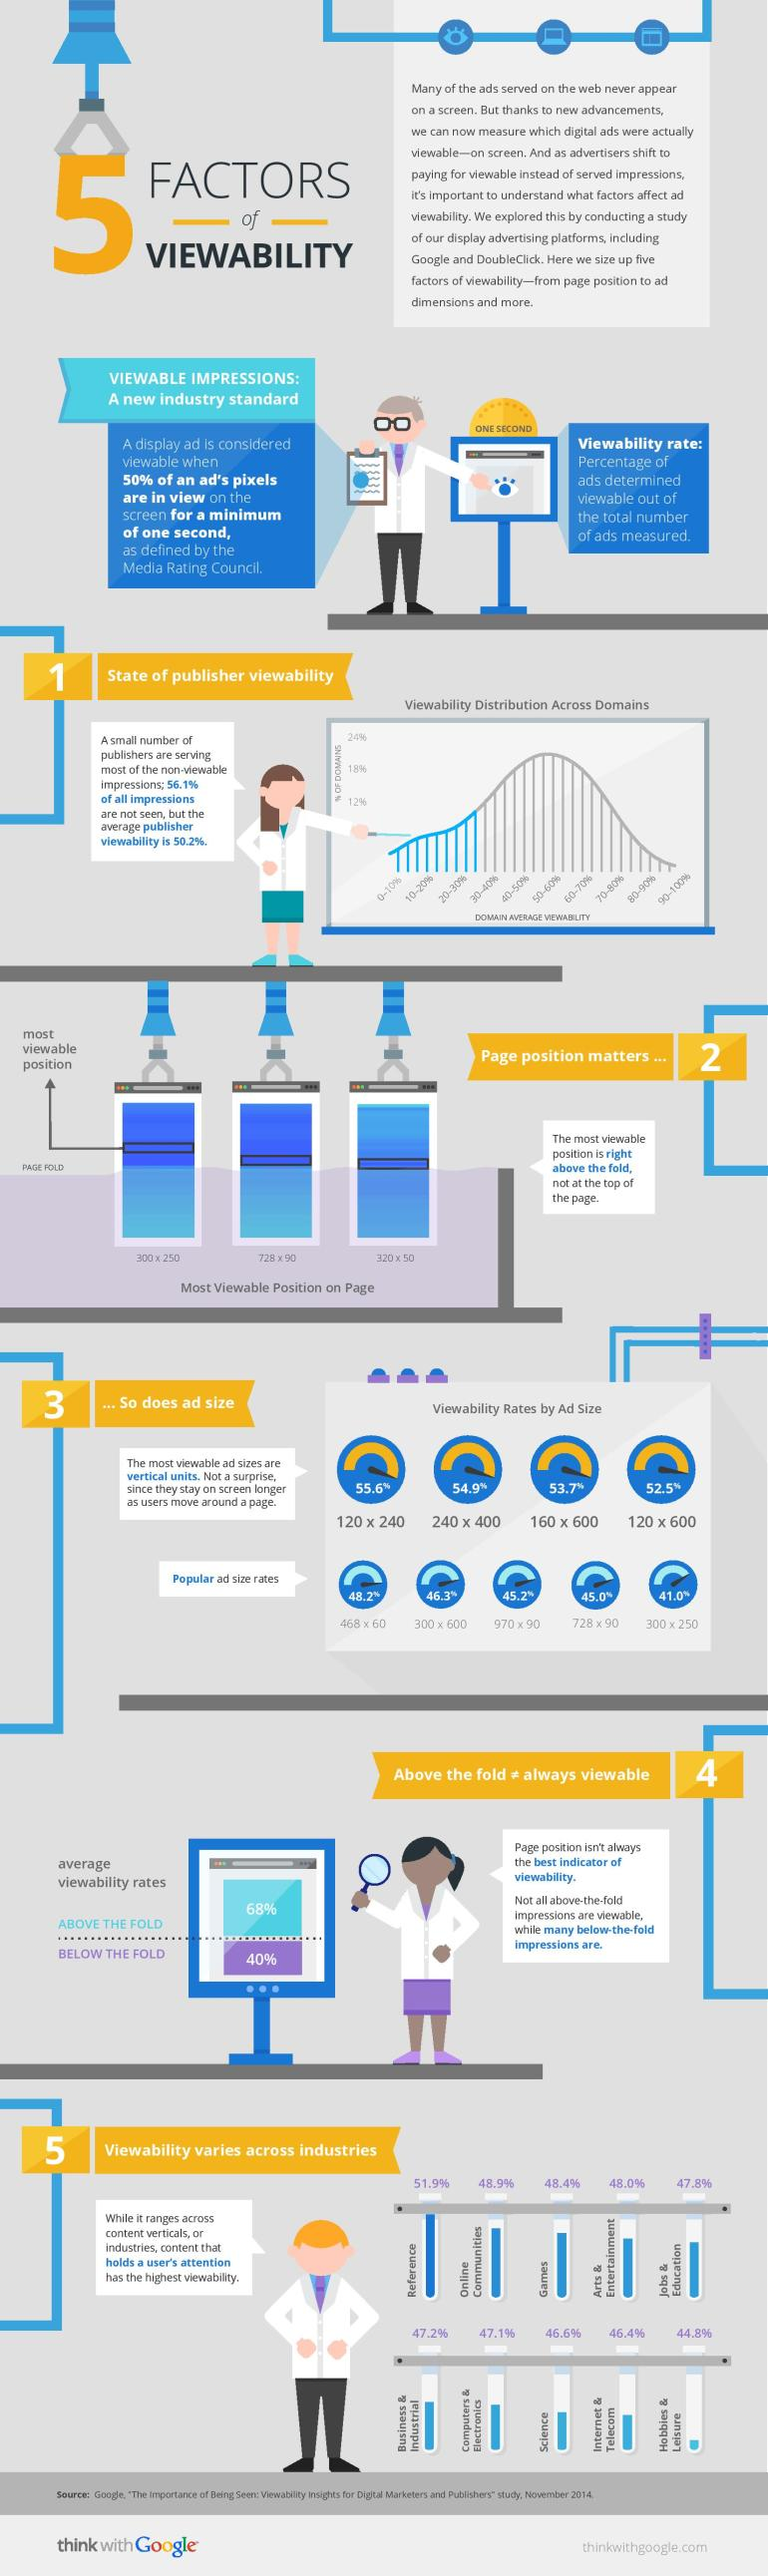 Factors That Affect Ad Viewability Google Infographic